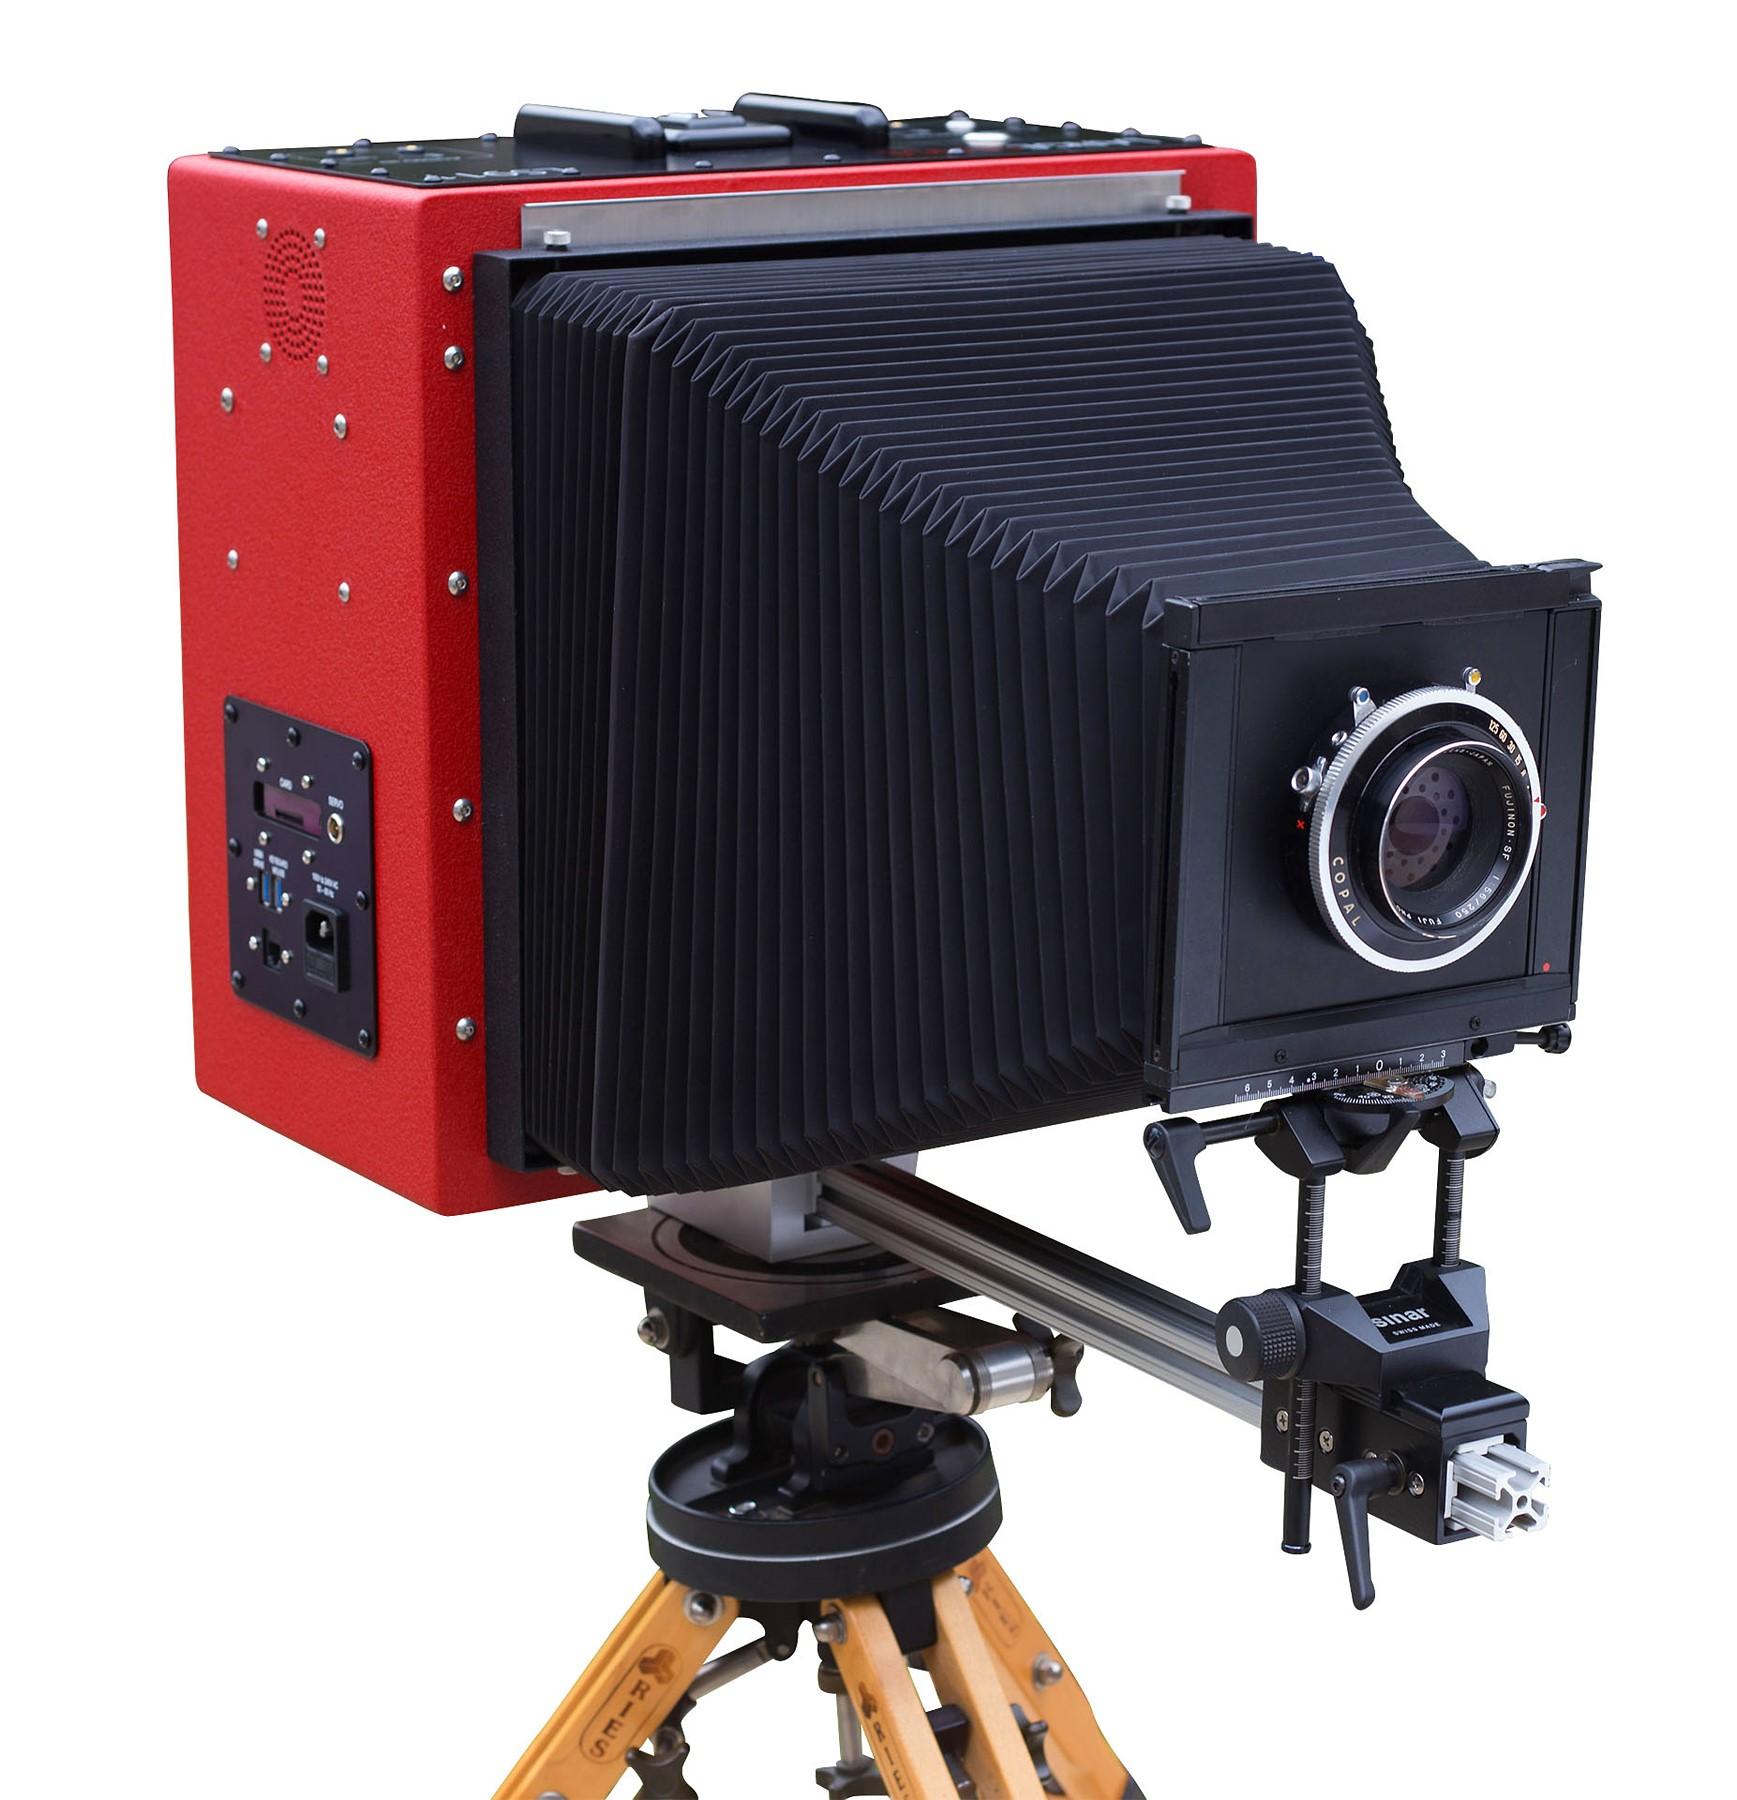 LS911 large format camera